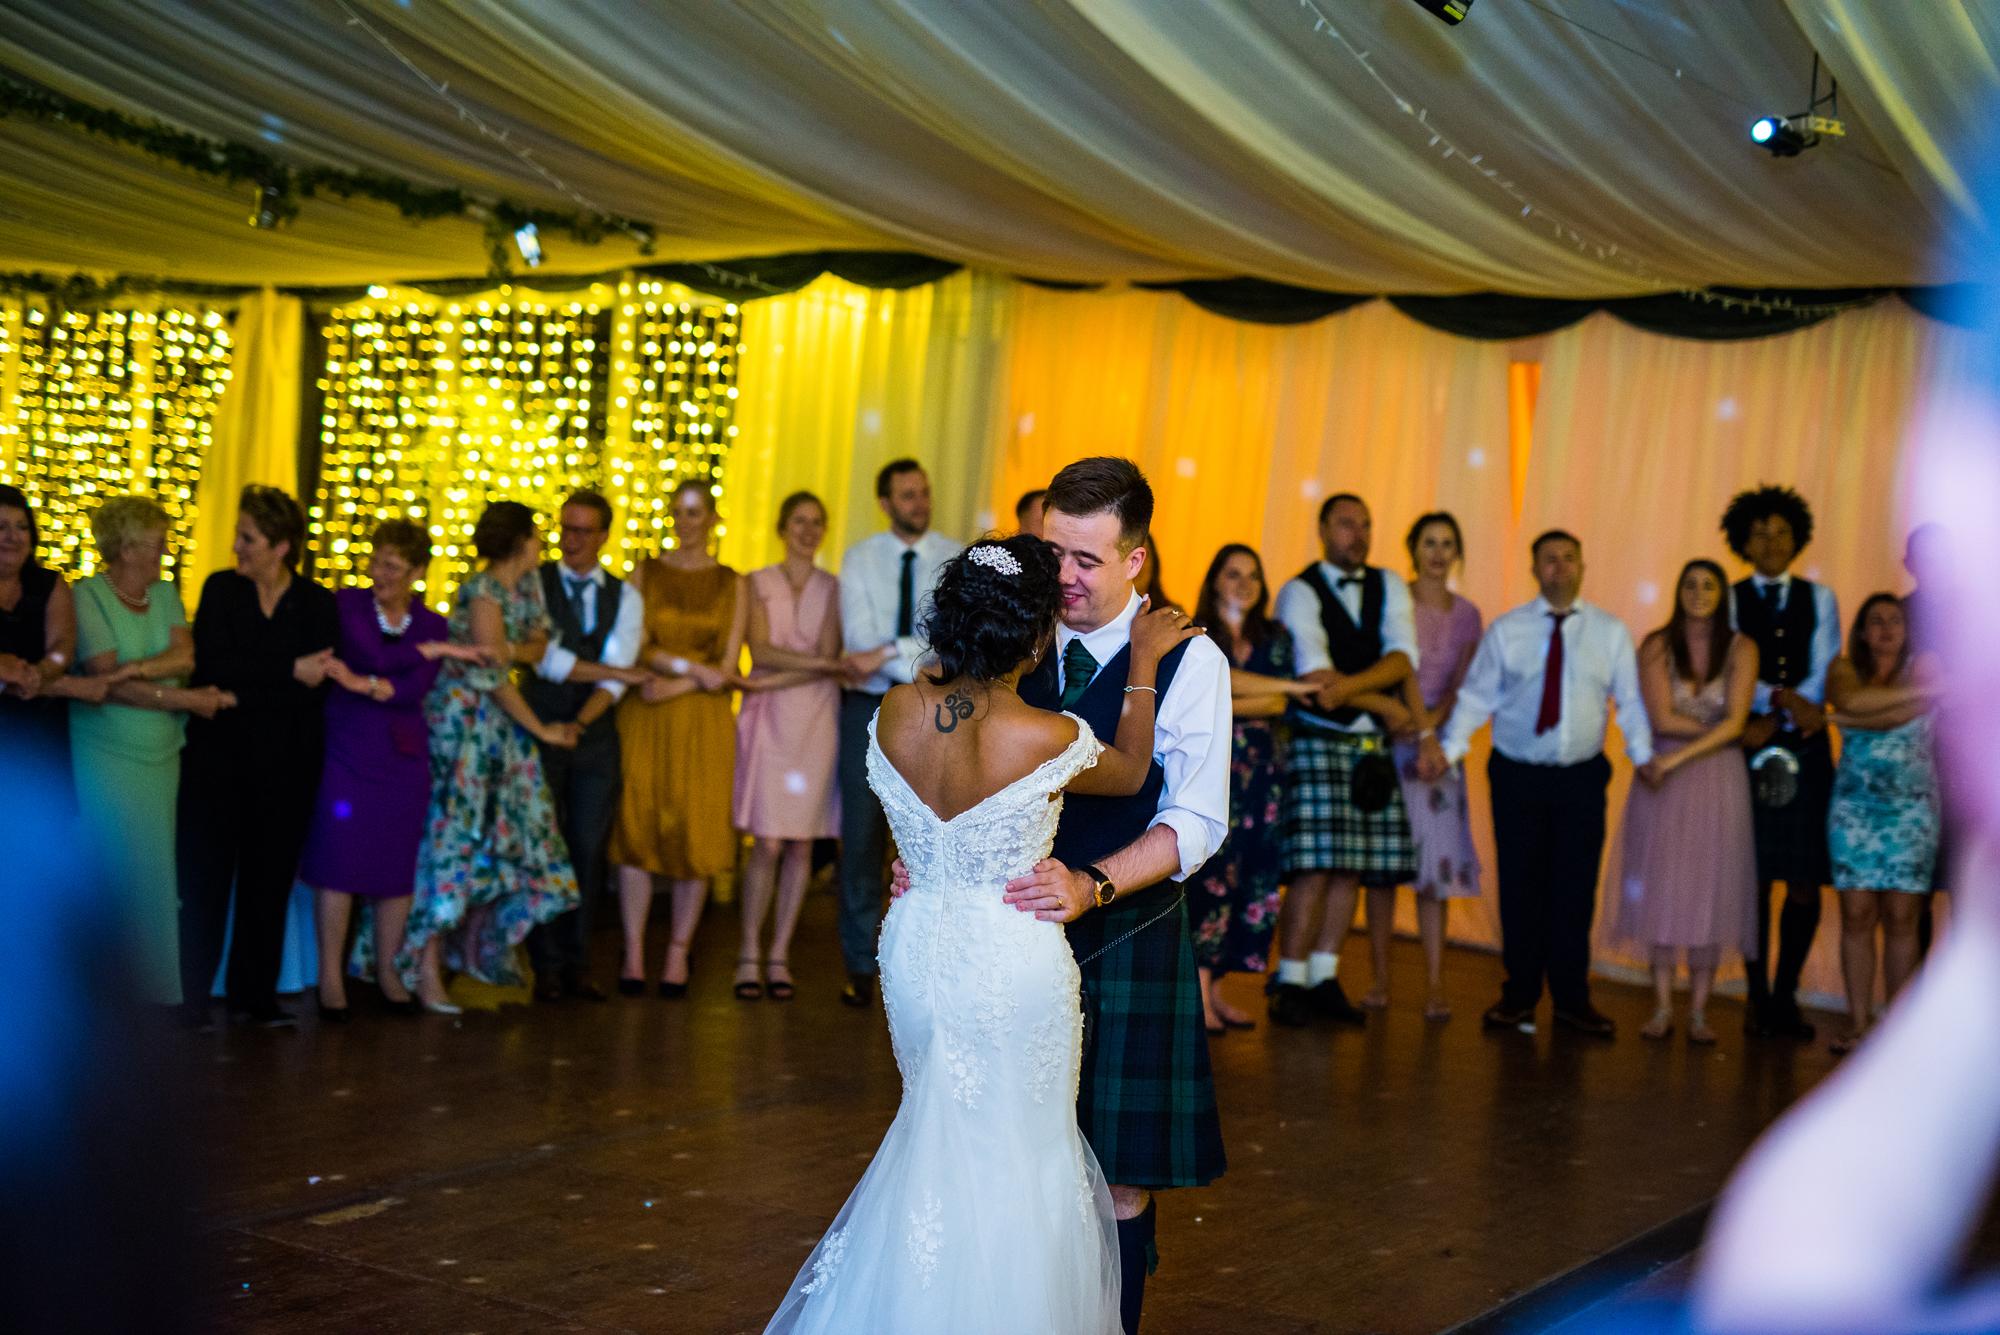 Kev and Shrabani wedding photos (342 of 350).jpg